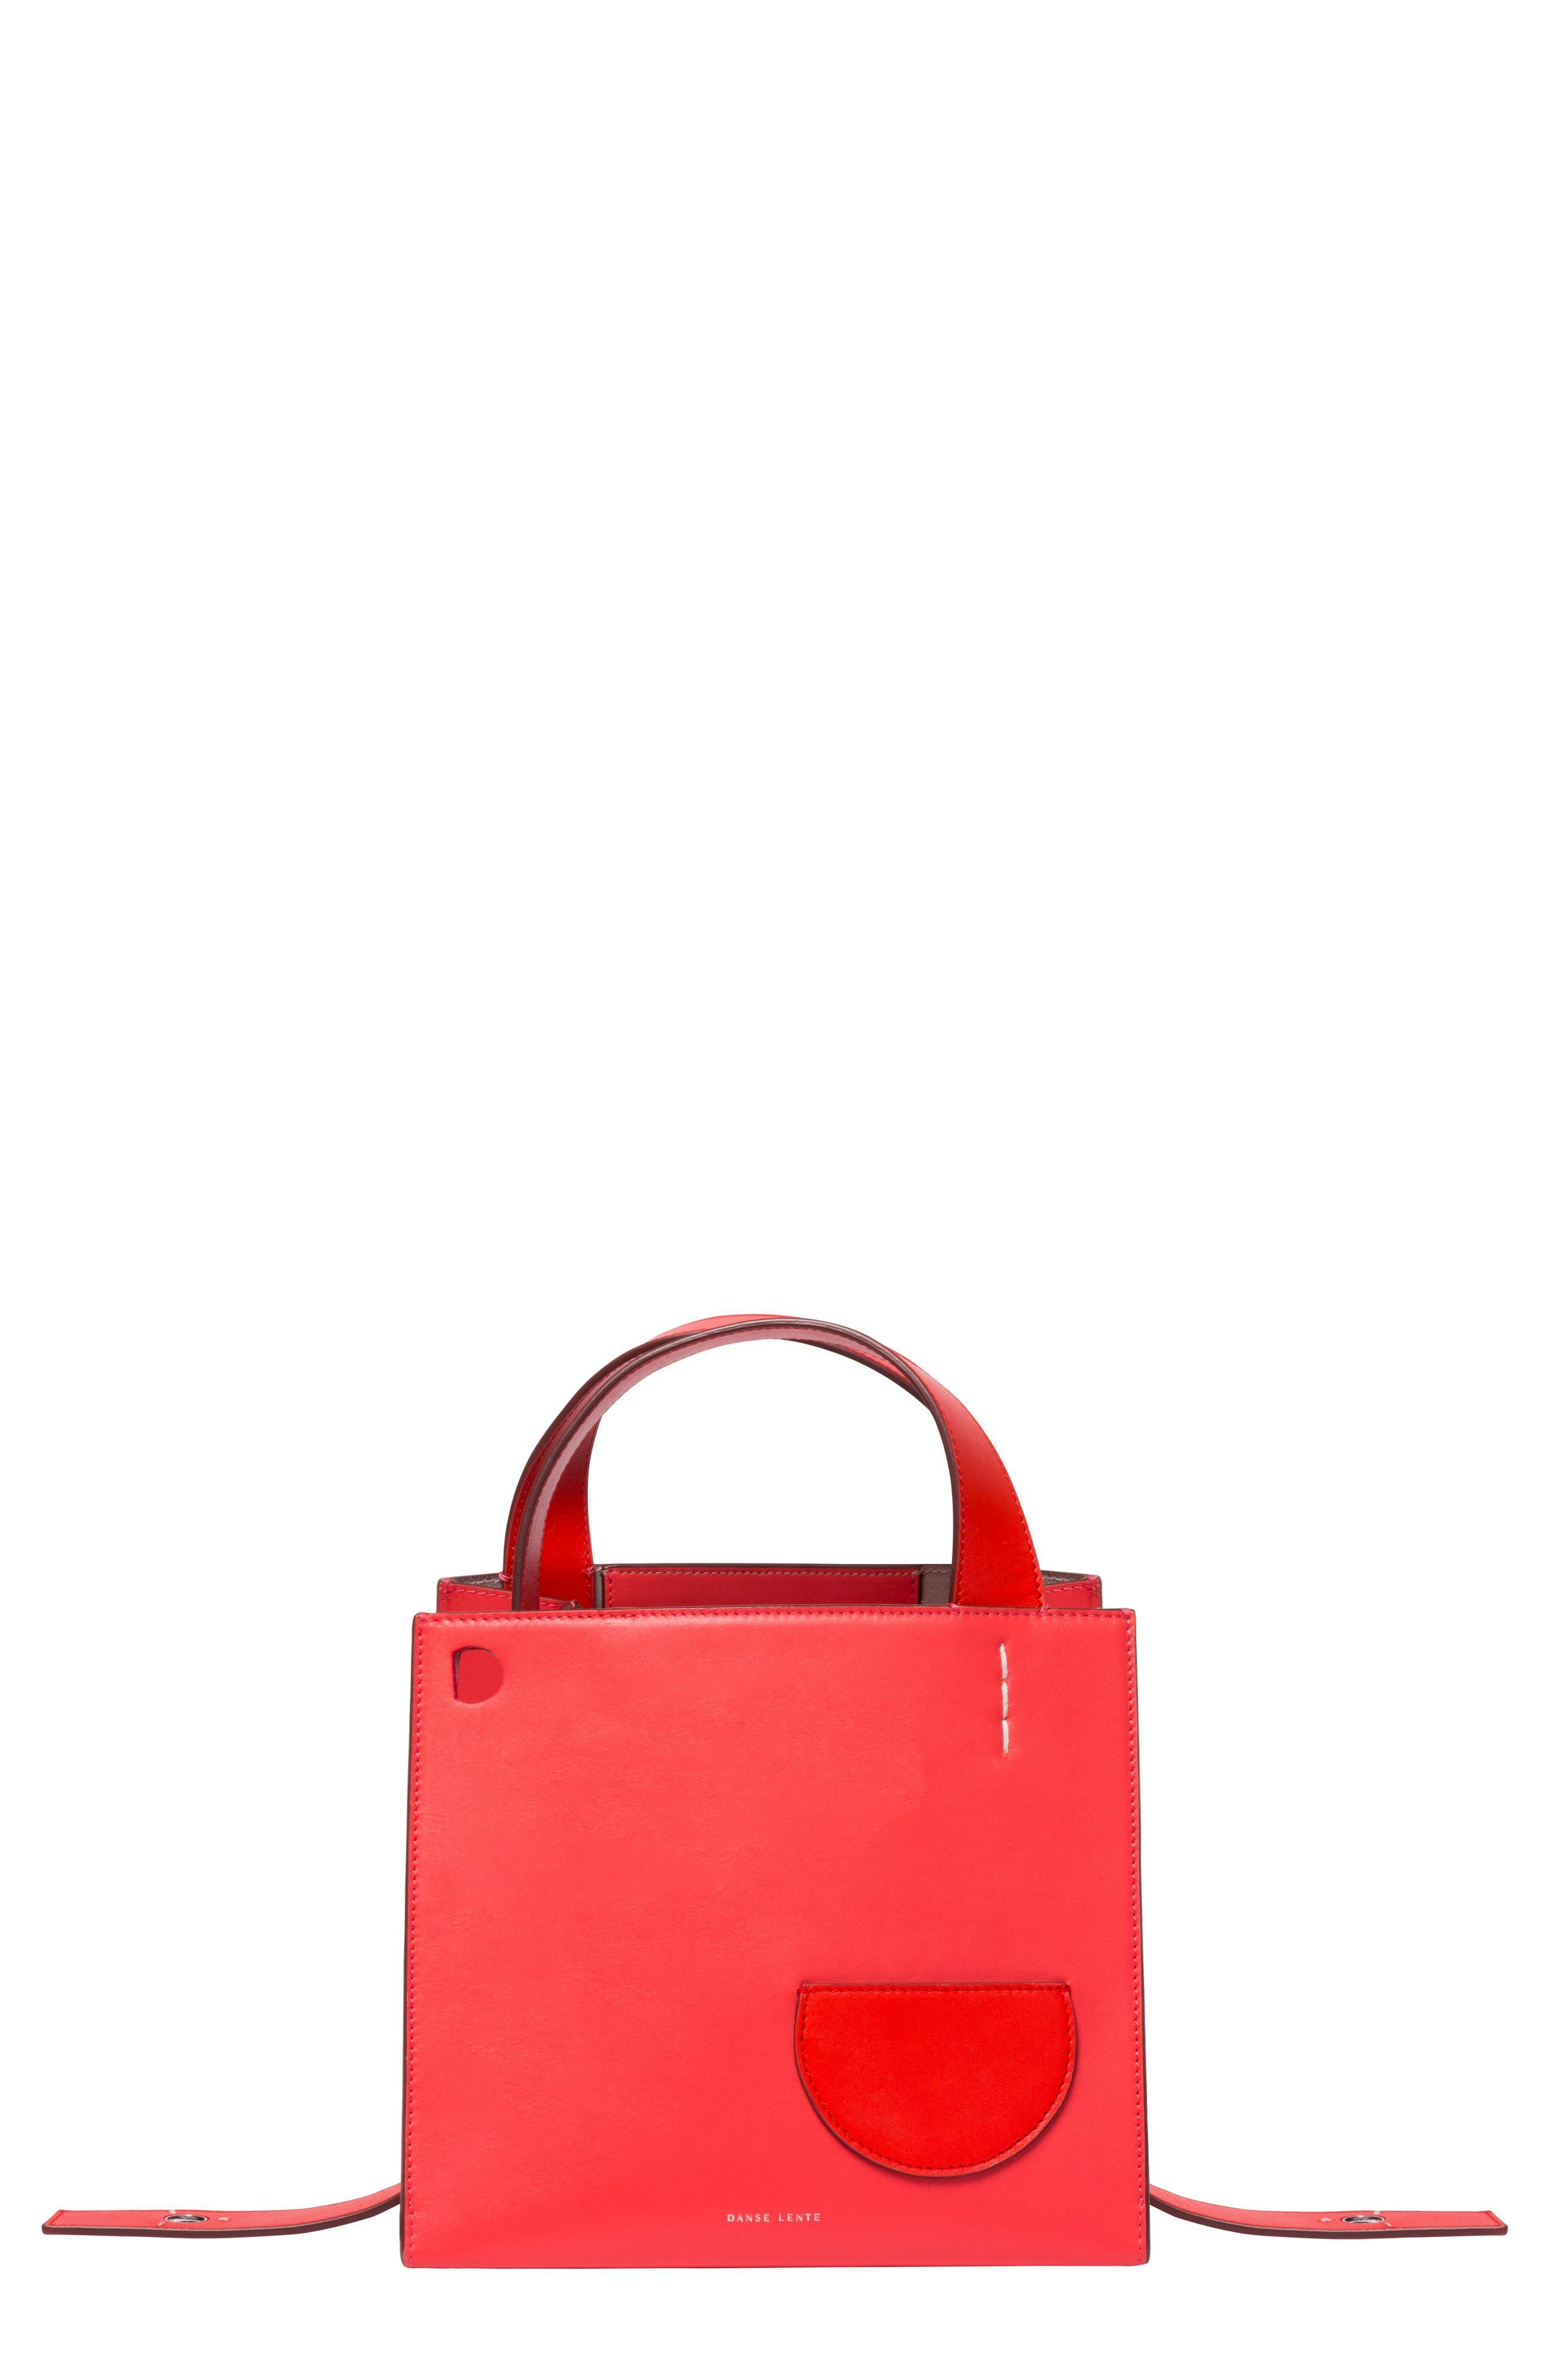 ... Leather   Genuine Shearling Tote Bag - Lyst. View fullscreen 4c60dcbcb0756